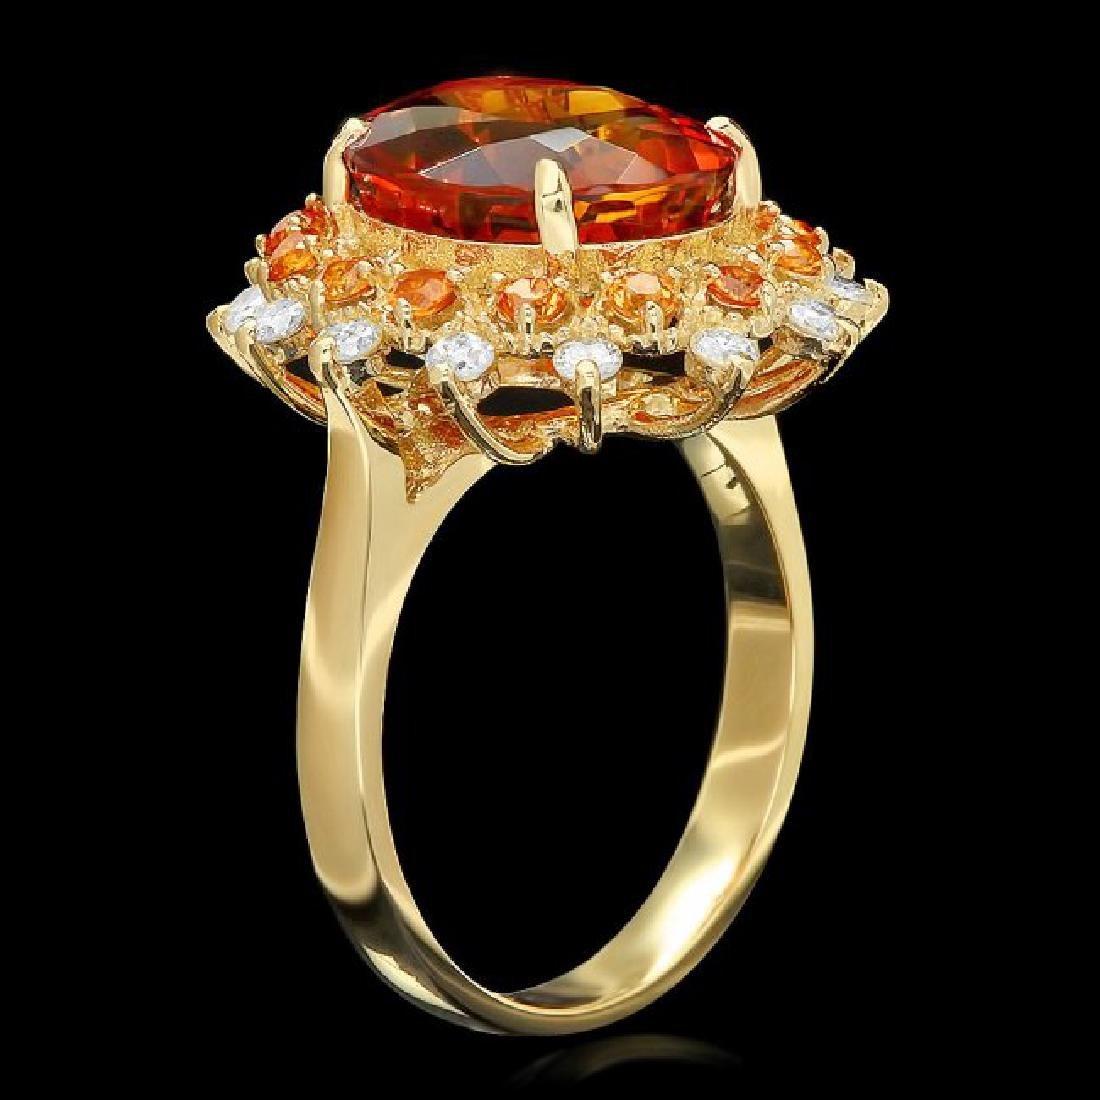 14k Gold 5.00ct Citrine 0.40ct Diamond Ring - 2